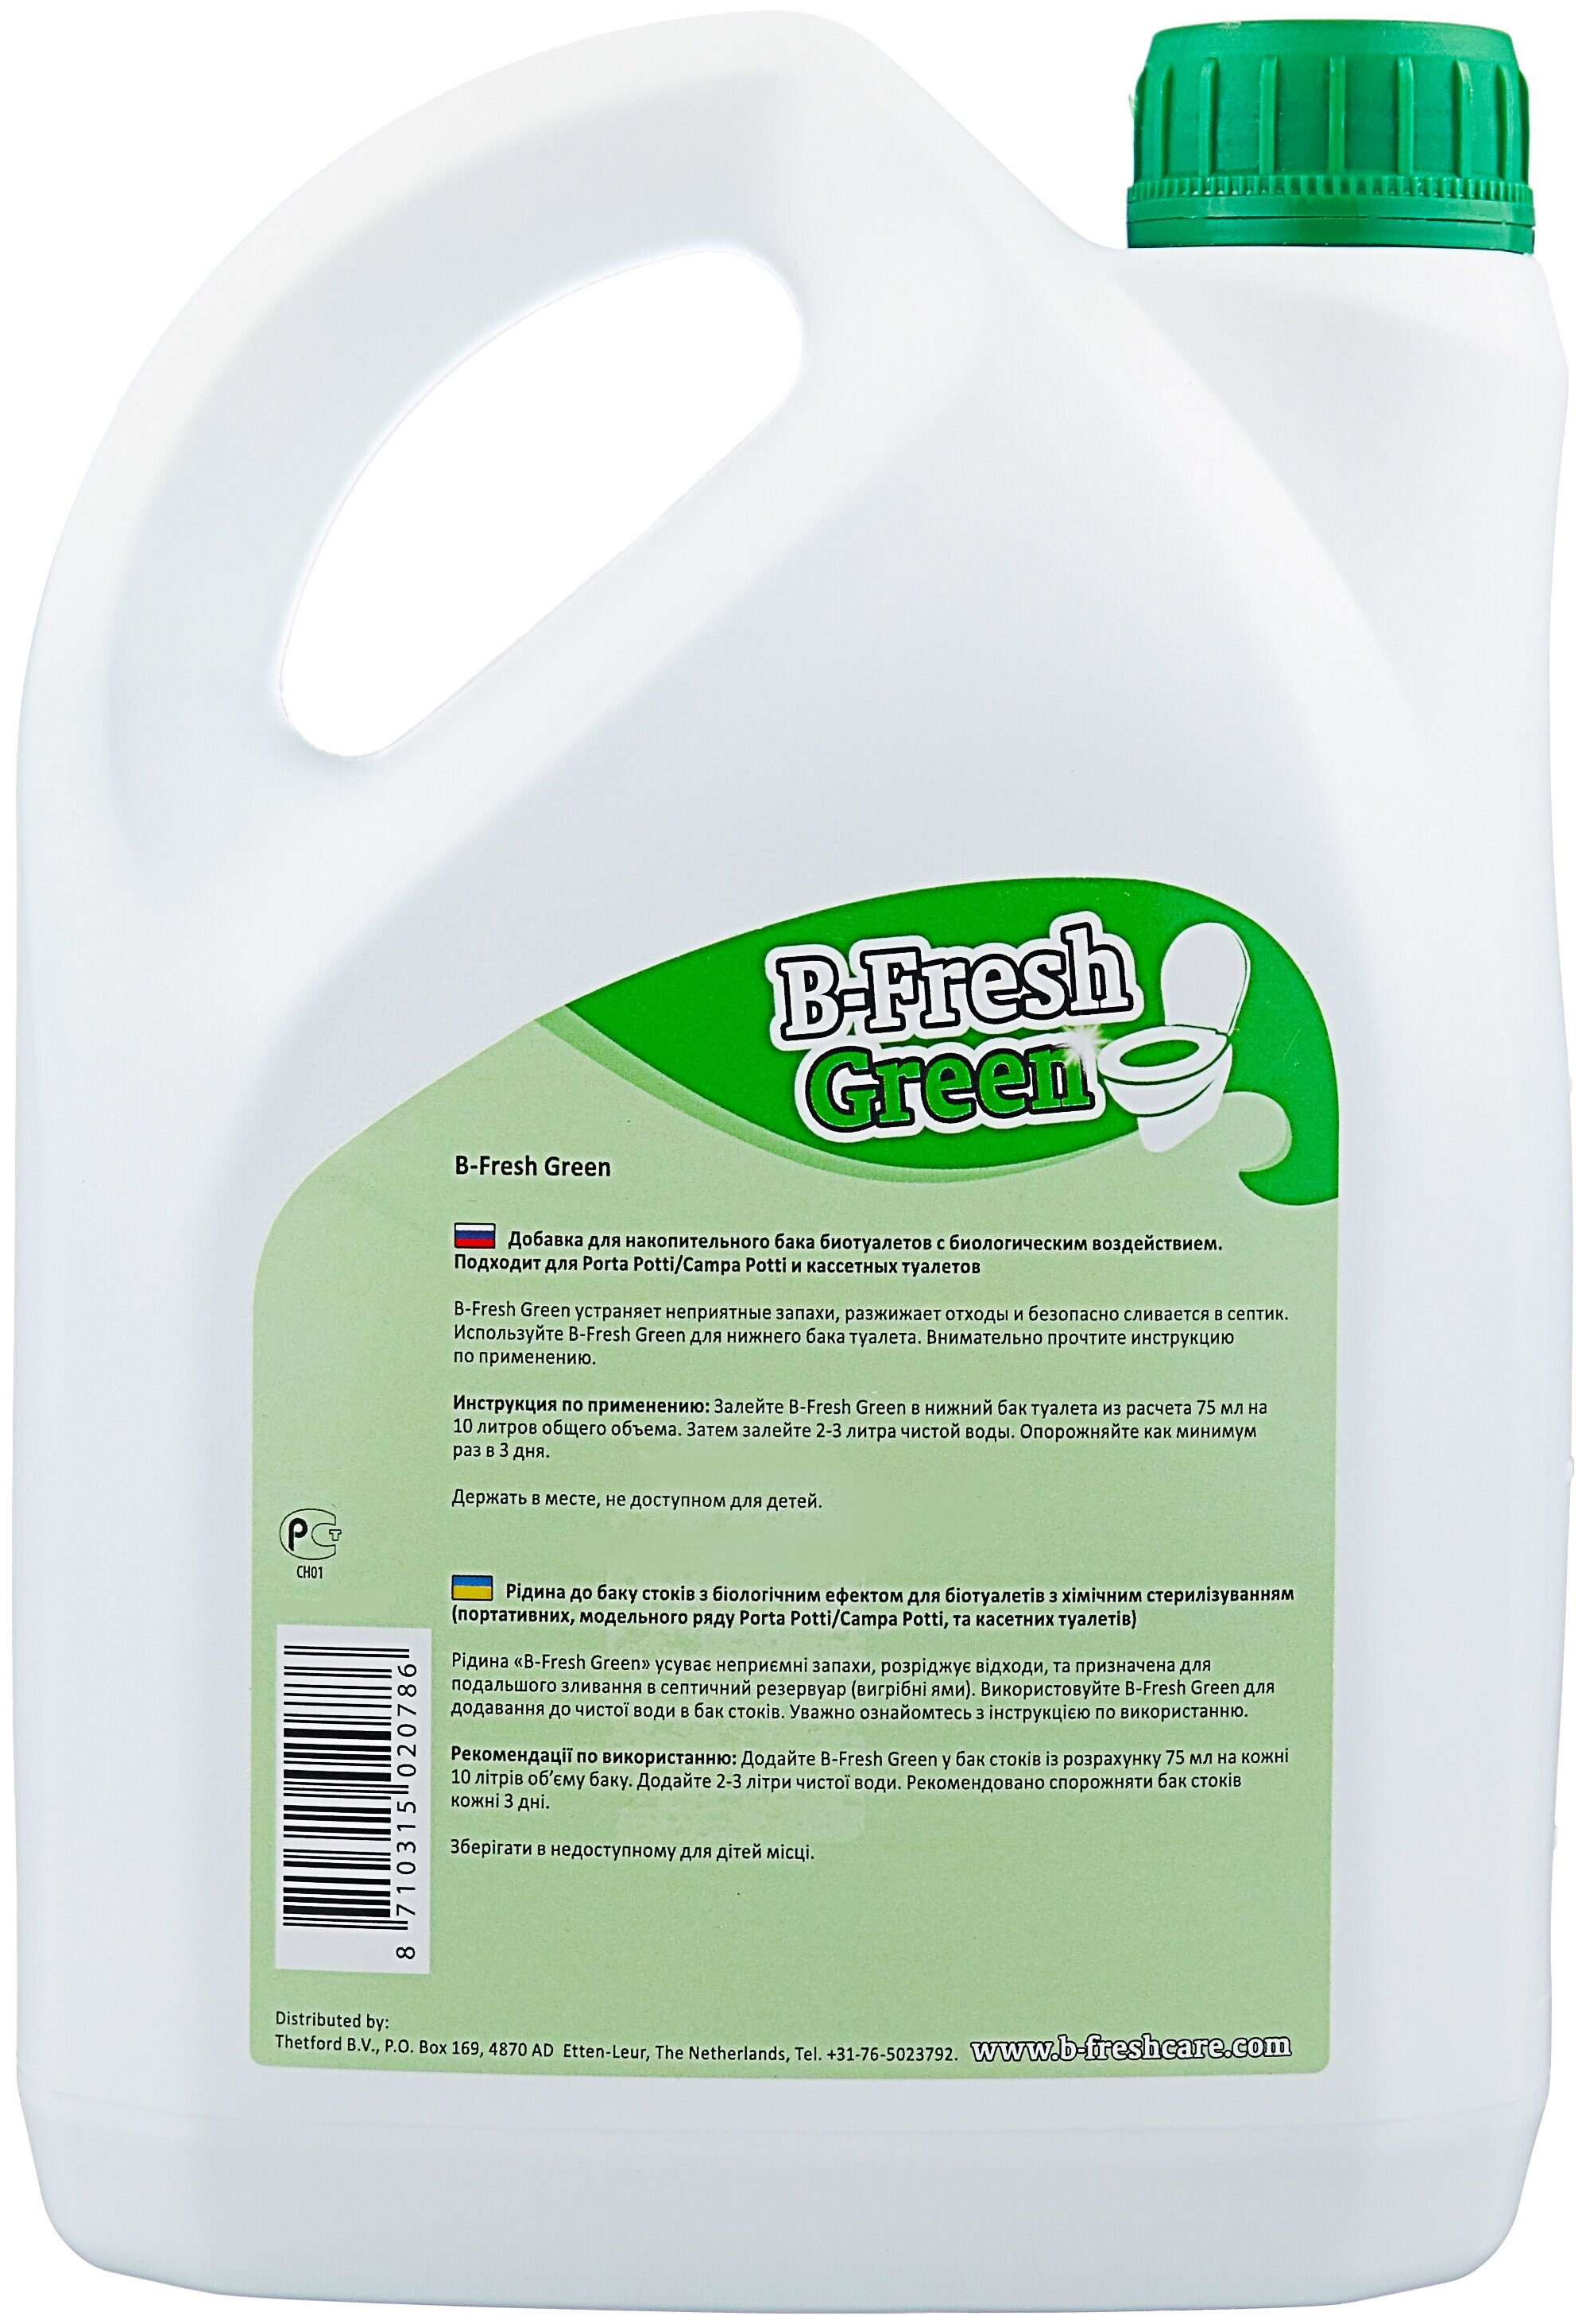 Thetford Туалетная жидкость B-Fresh Green 2 л